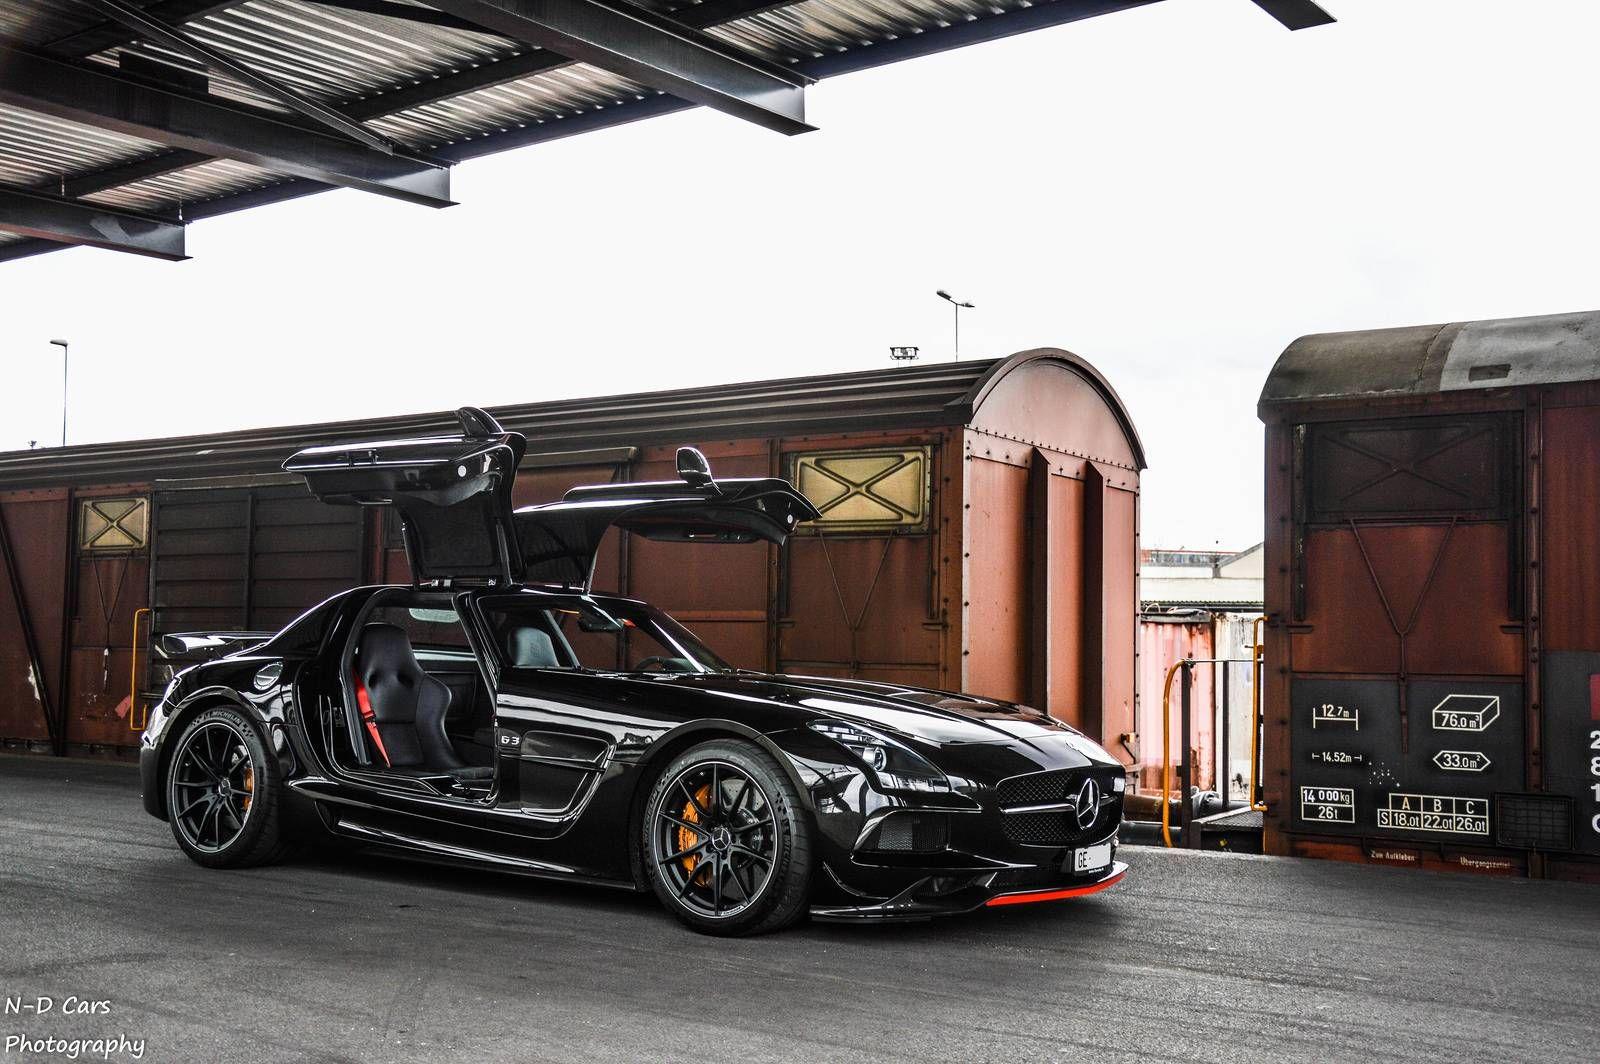 Mercedes Benz Sls Amg Black Series Car Lust Black